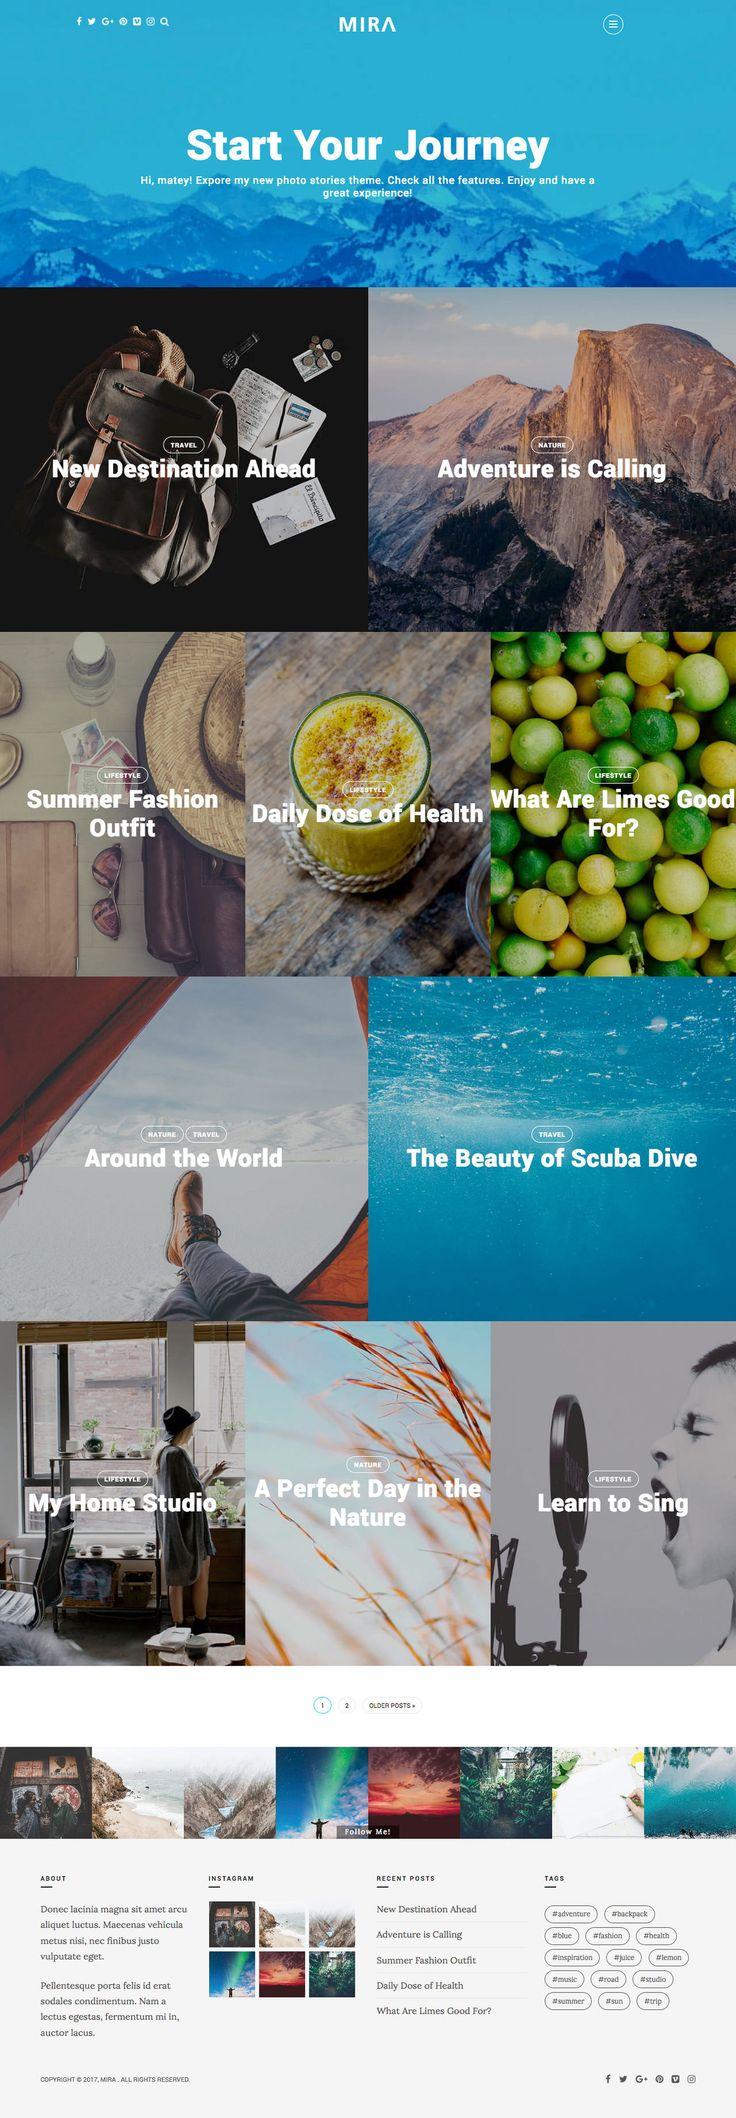 Mira  A Photo Stories WordPress Theme (More web design inspiration at topdesigninspiration.com) #design #web #webdesign #sitedesign #responsive #ux #ui